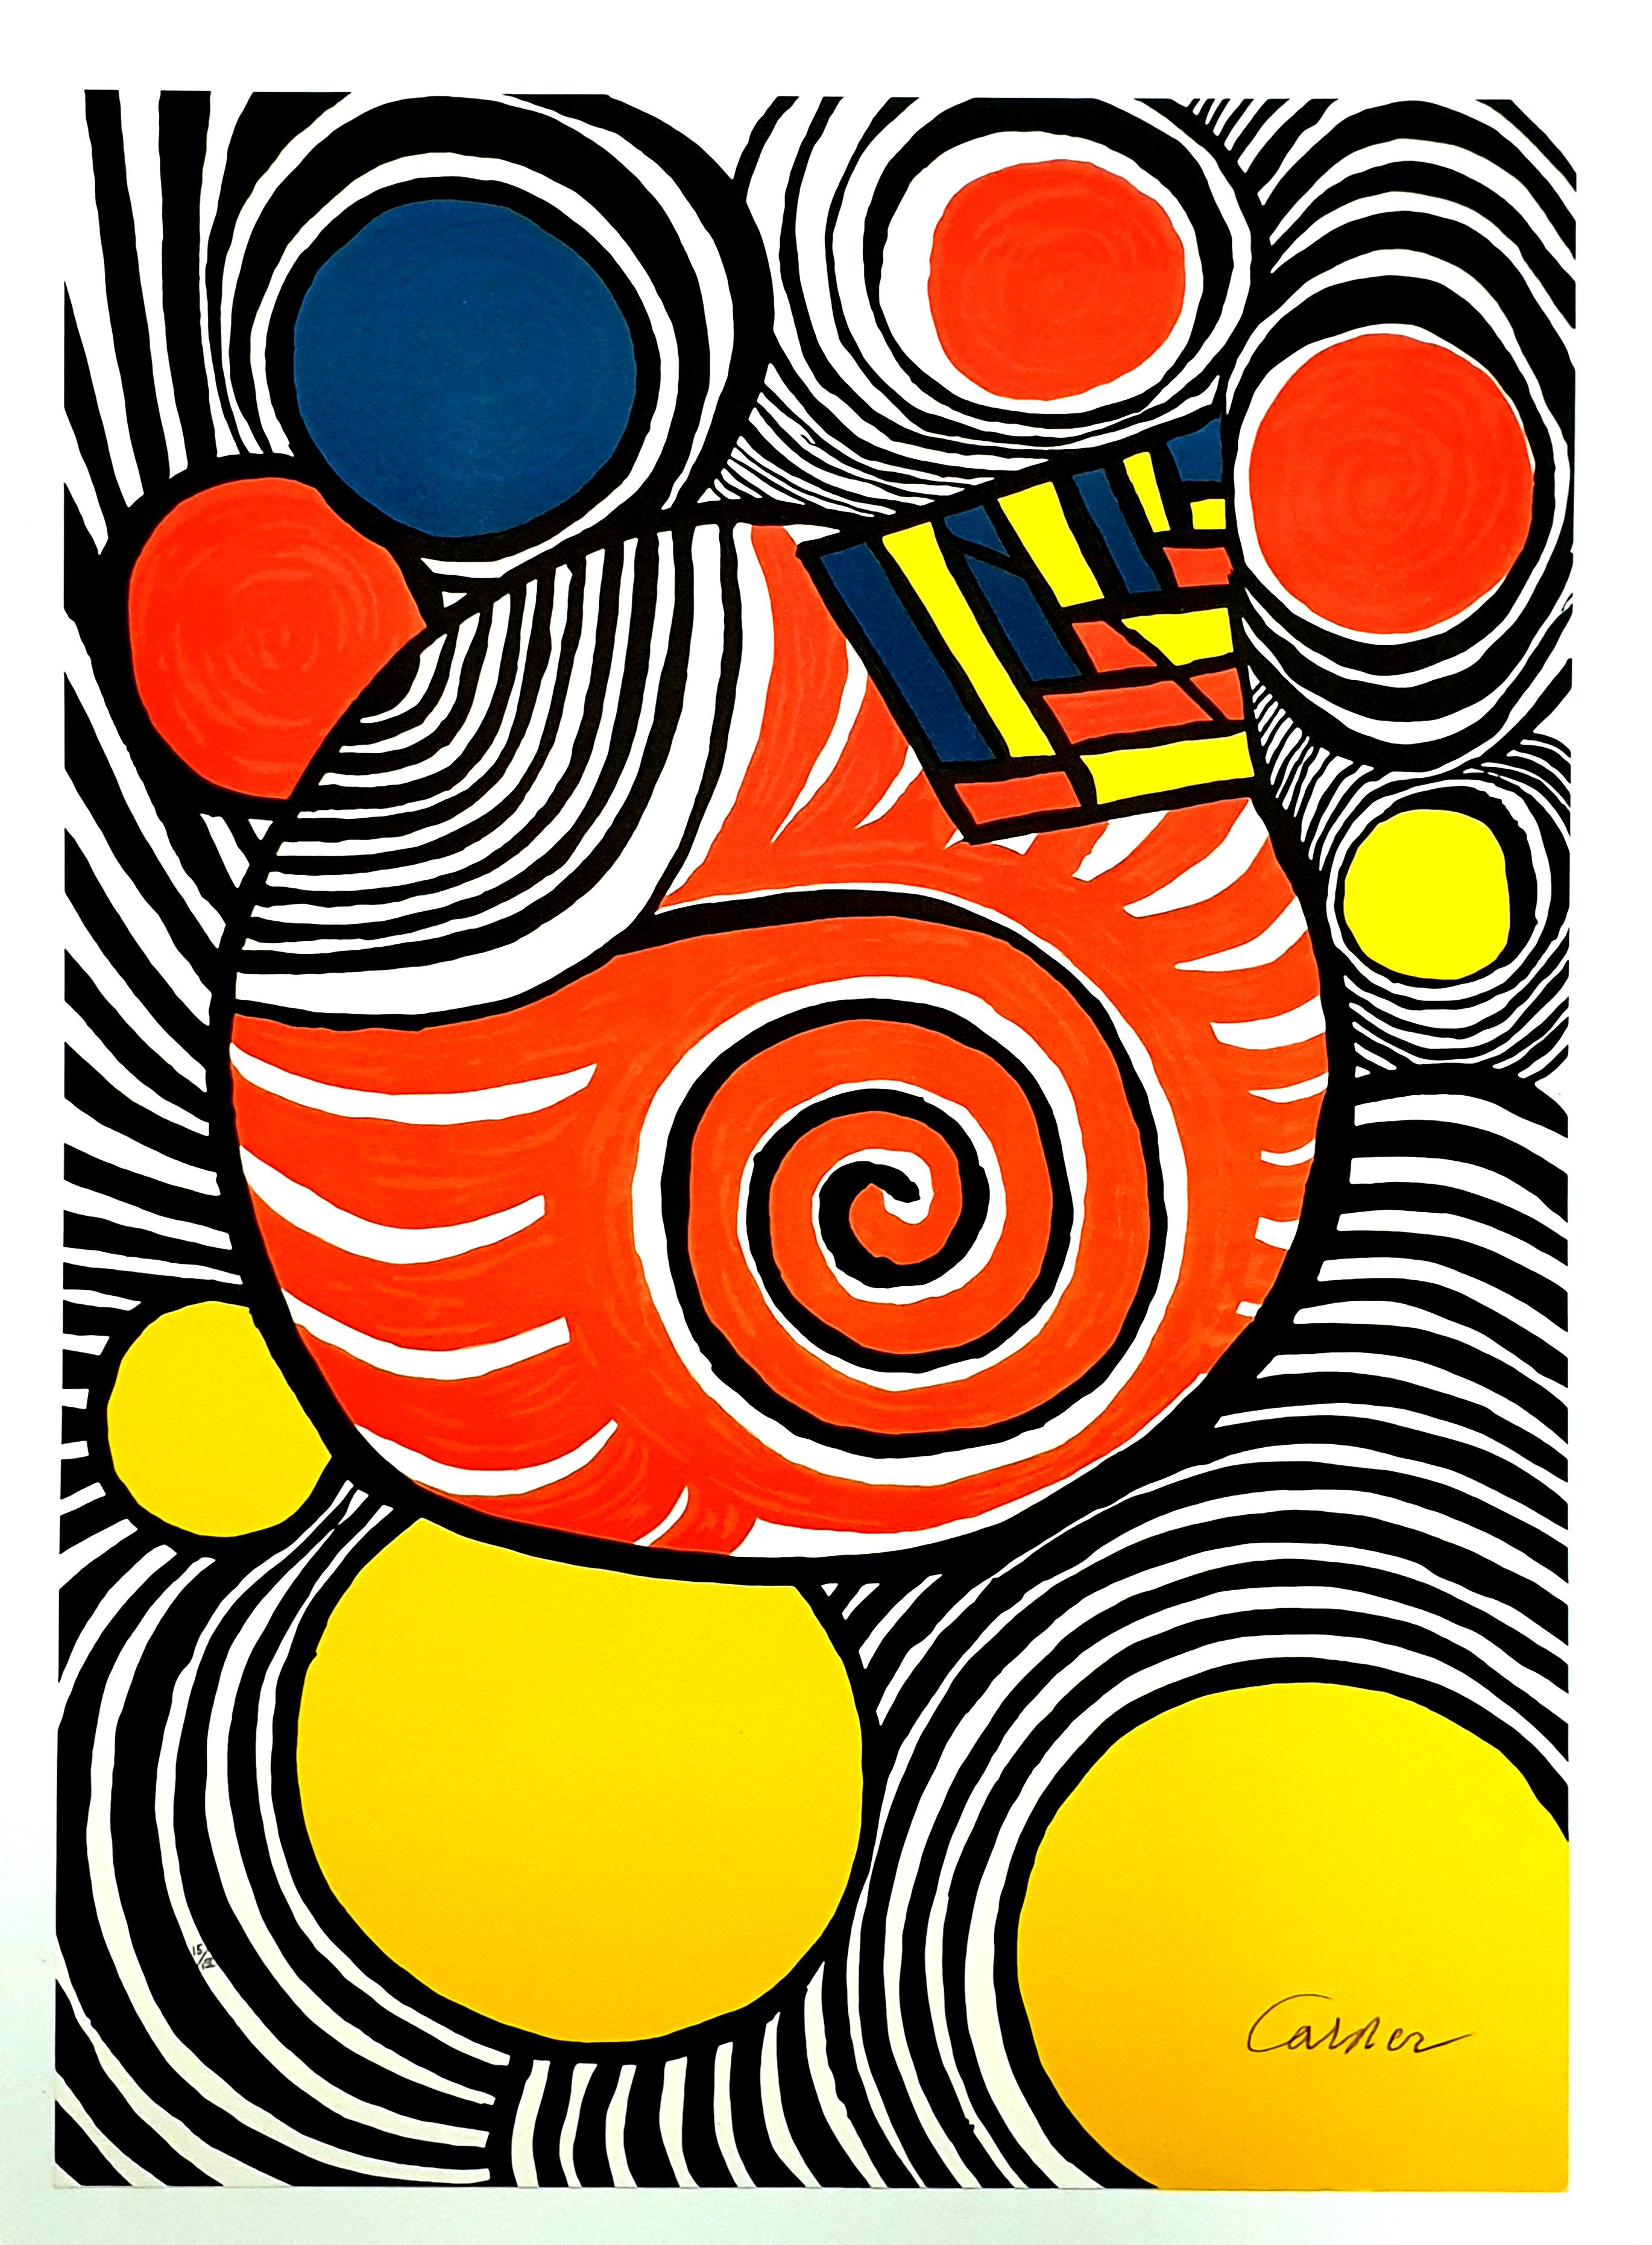 Alexander Calder - Clown - Original Handsigned Lithograph